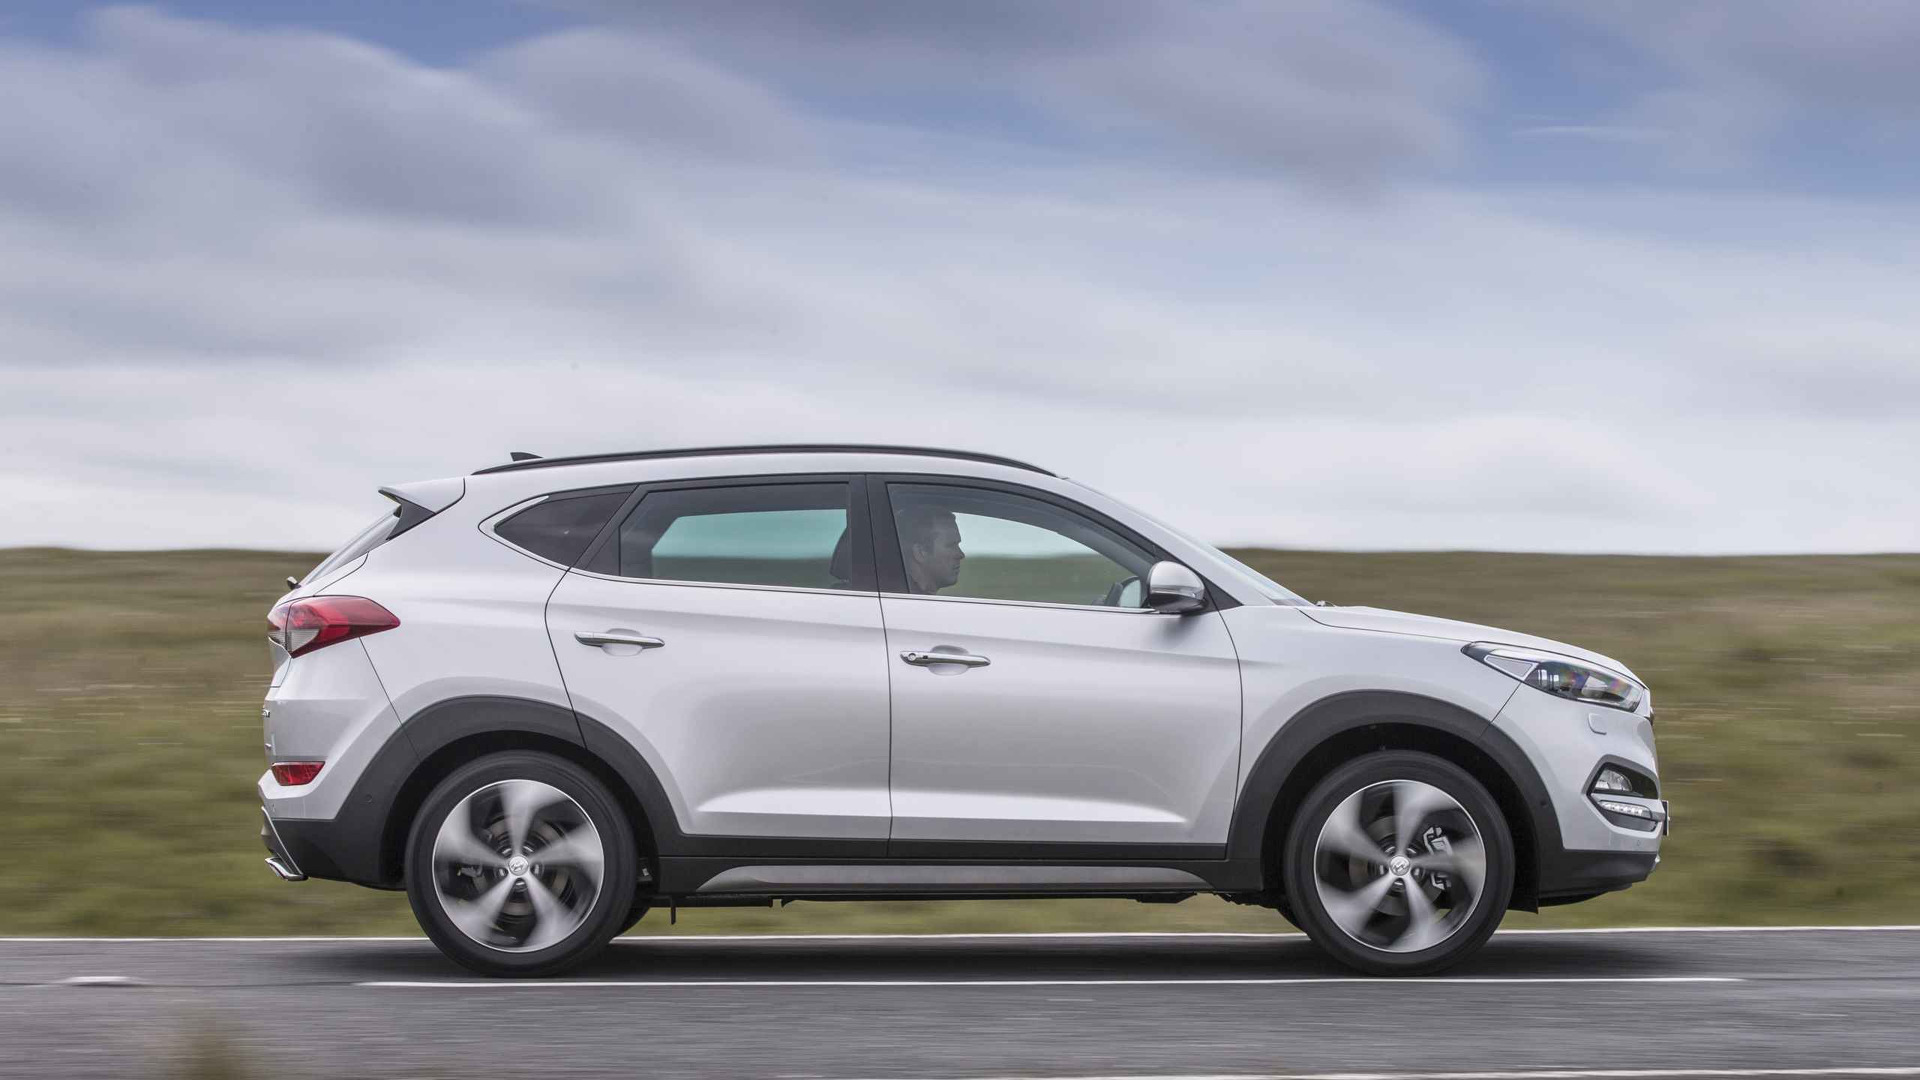 2017 Hyundai Tucson Review